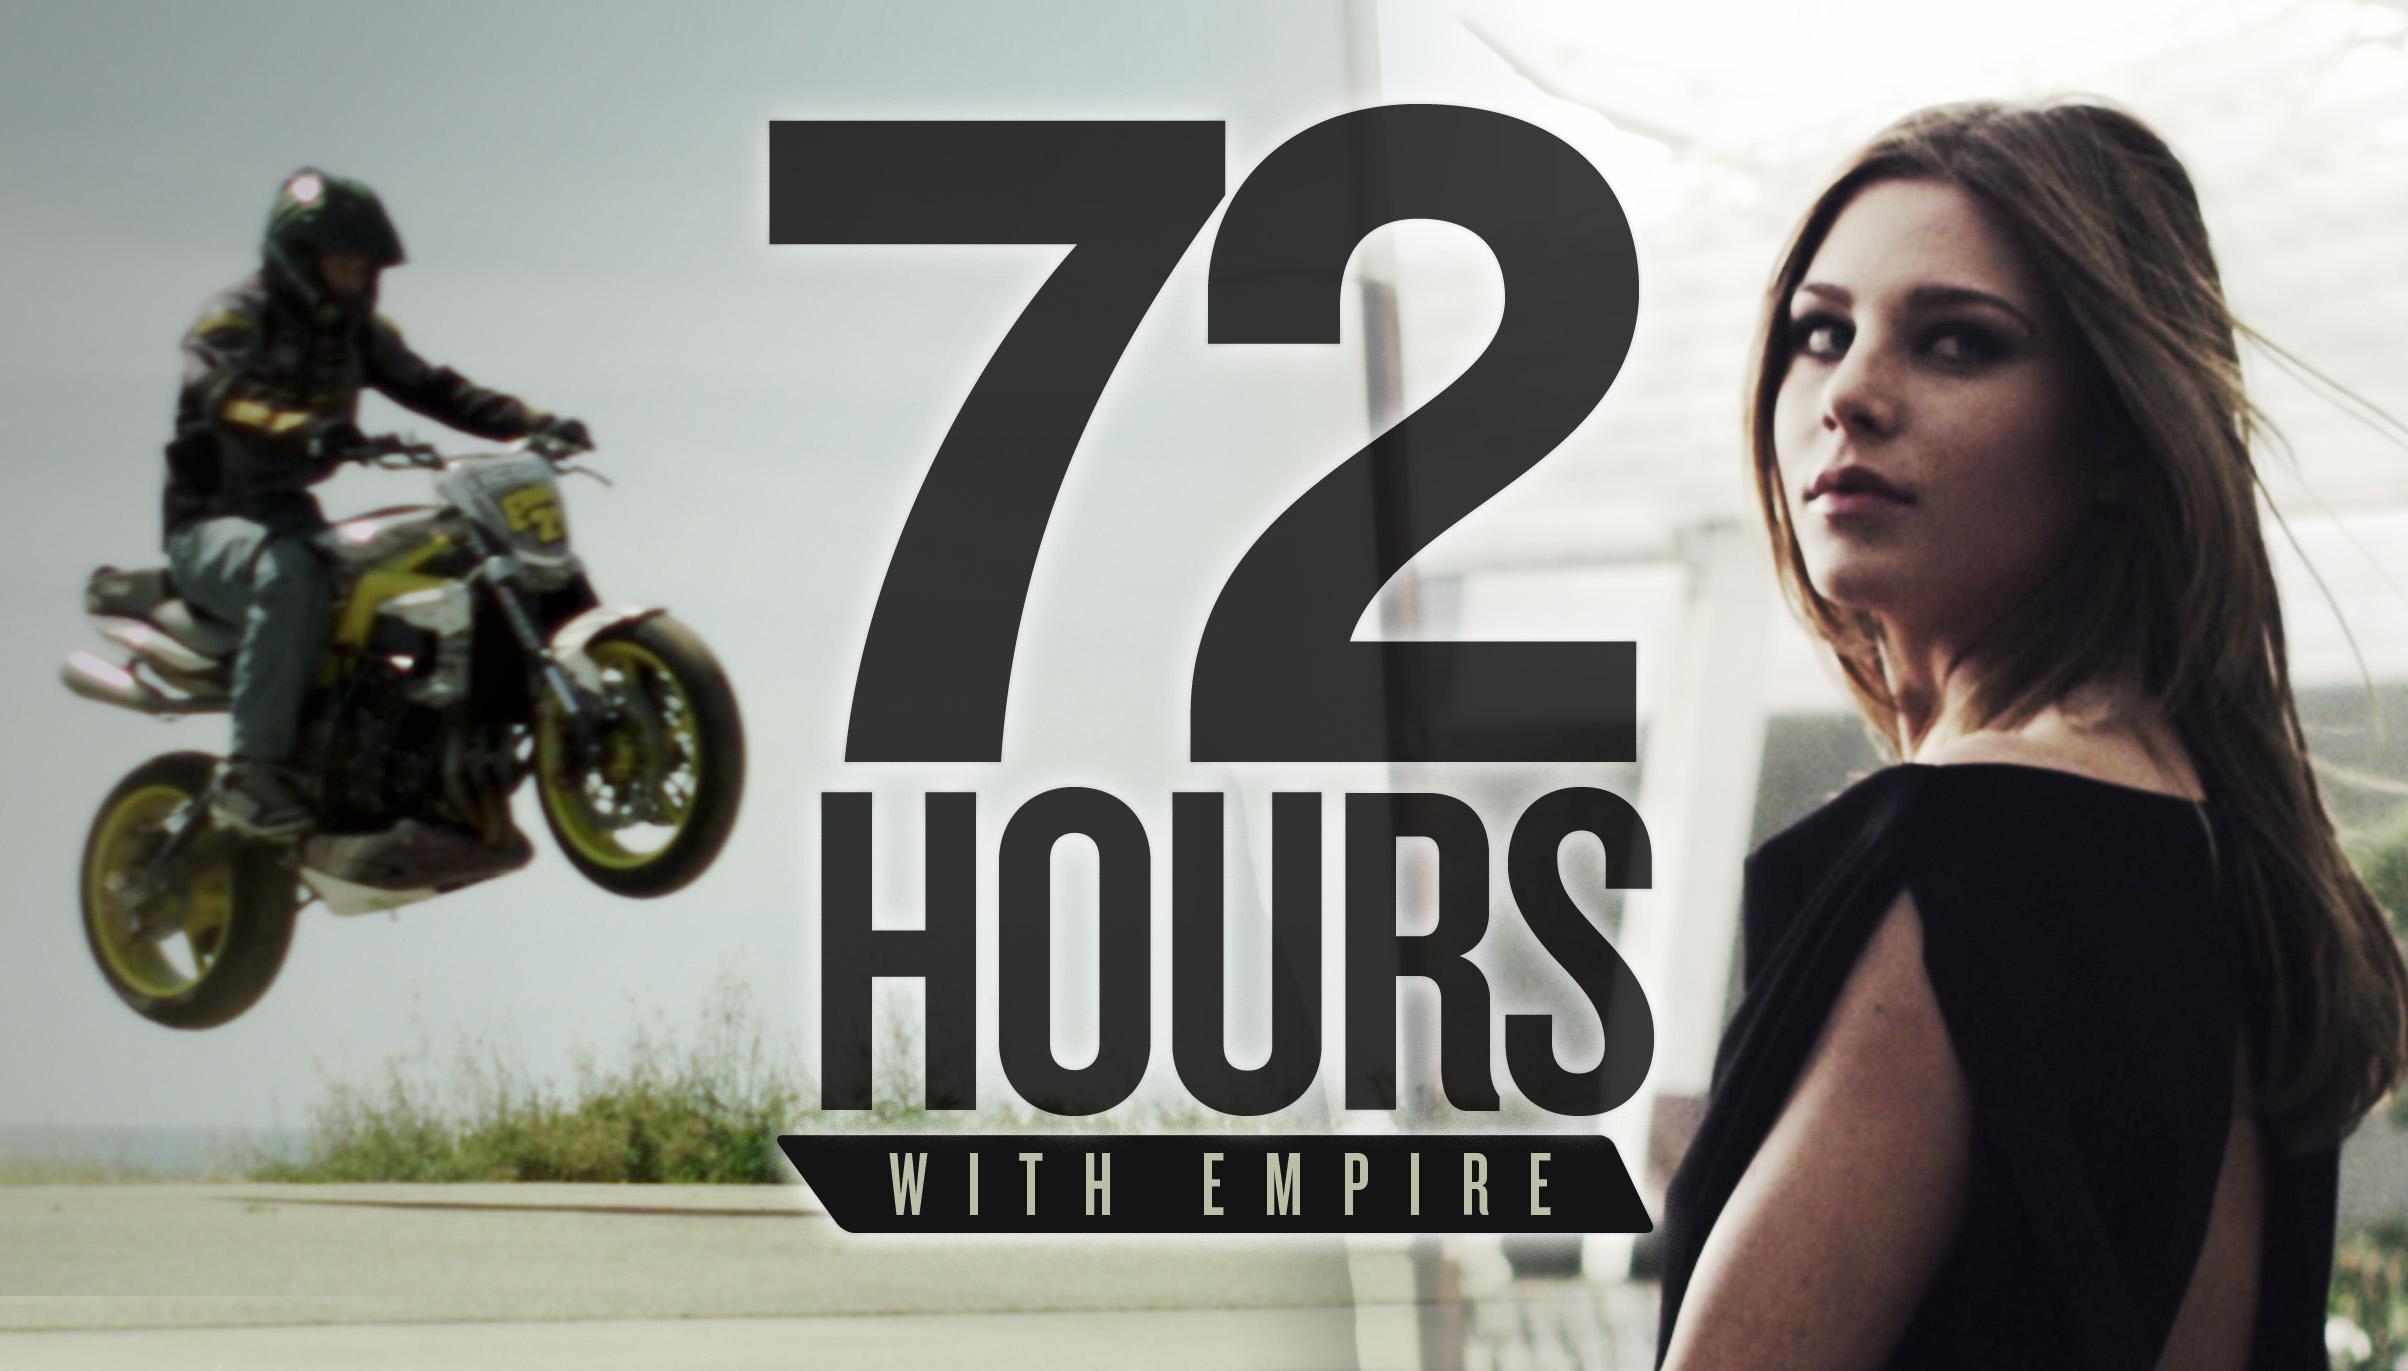 72HOURS.JPG